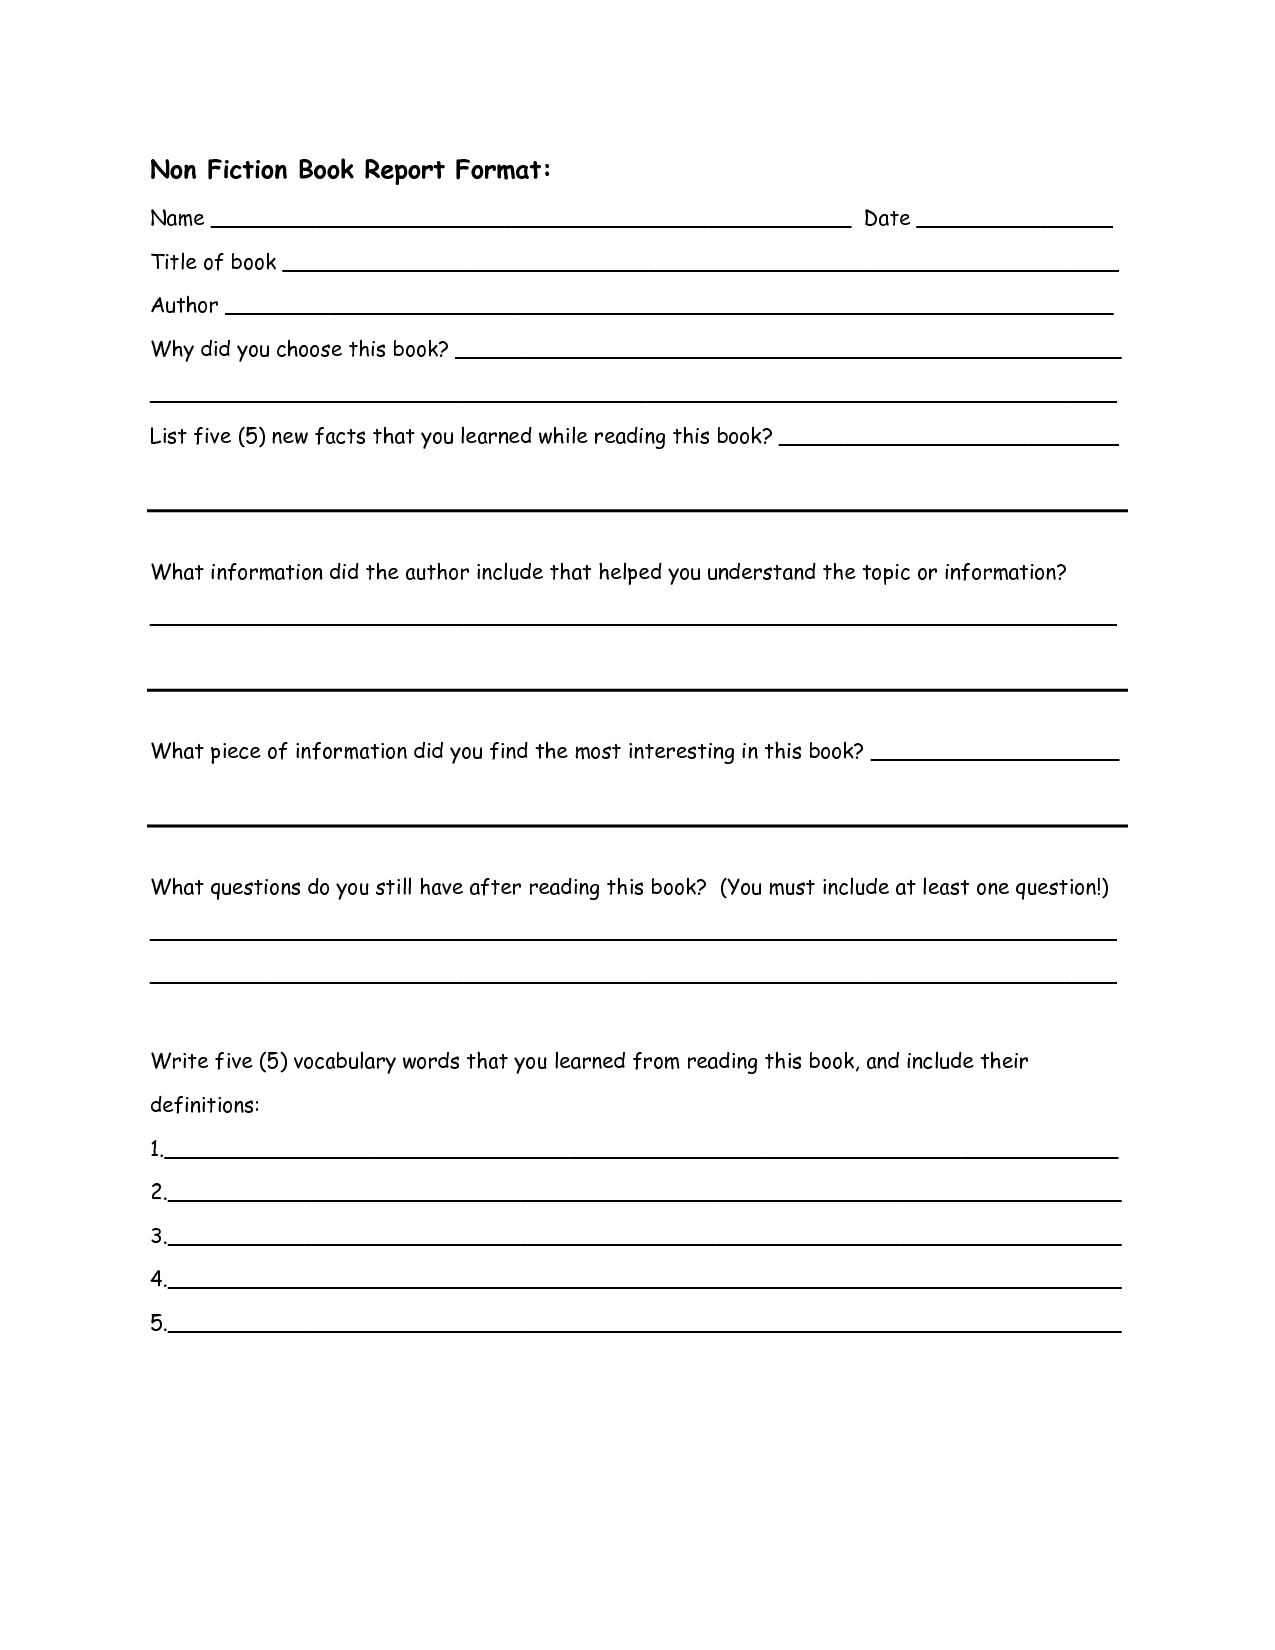 Non Fiction Book Report Format